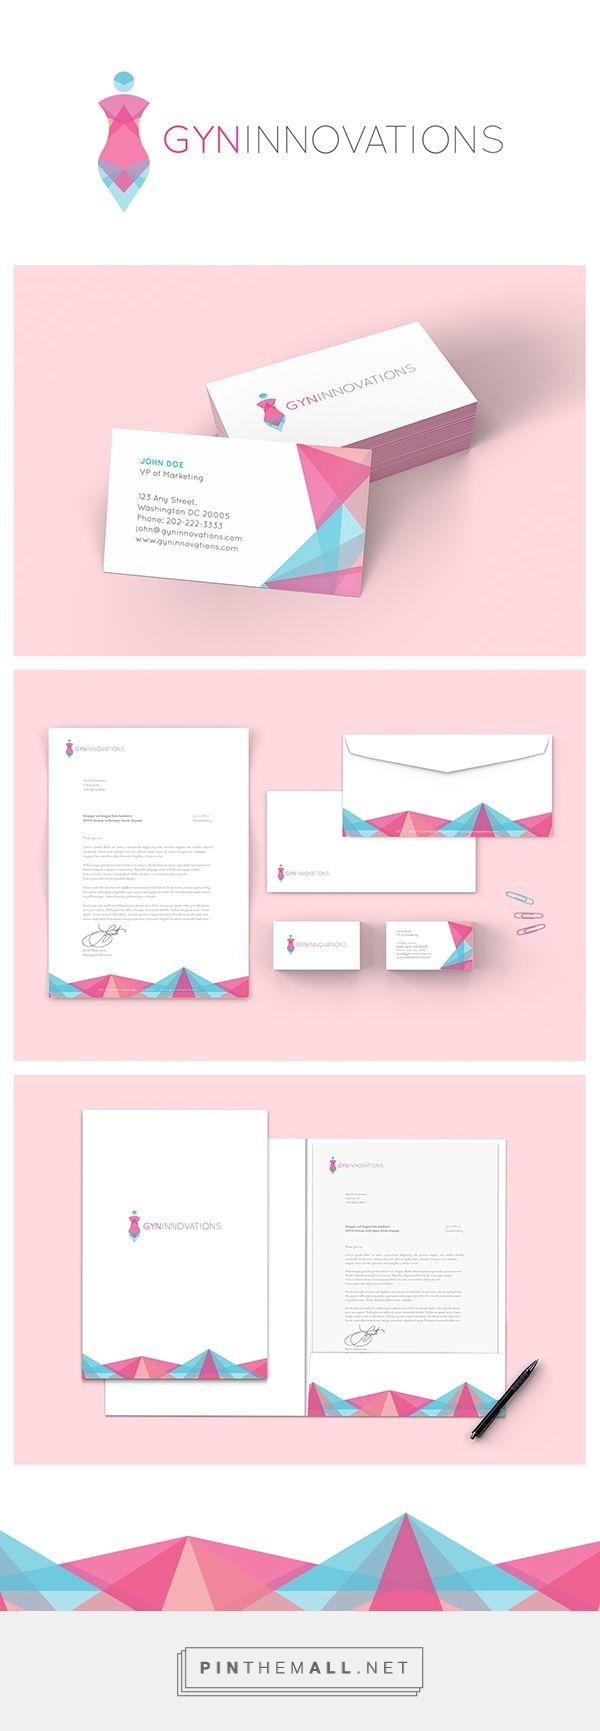 GYN Innovations on Behance   Fivestar Branding – Design and Branding Agency & Inspiration Gallery